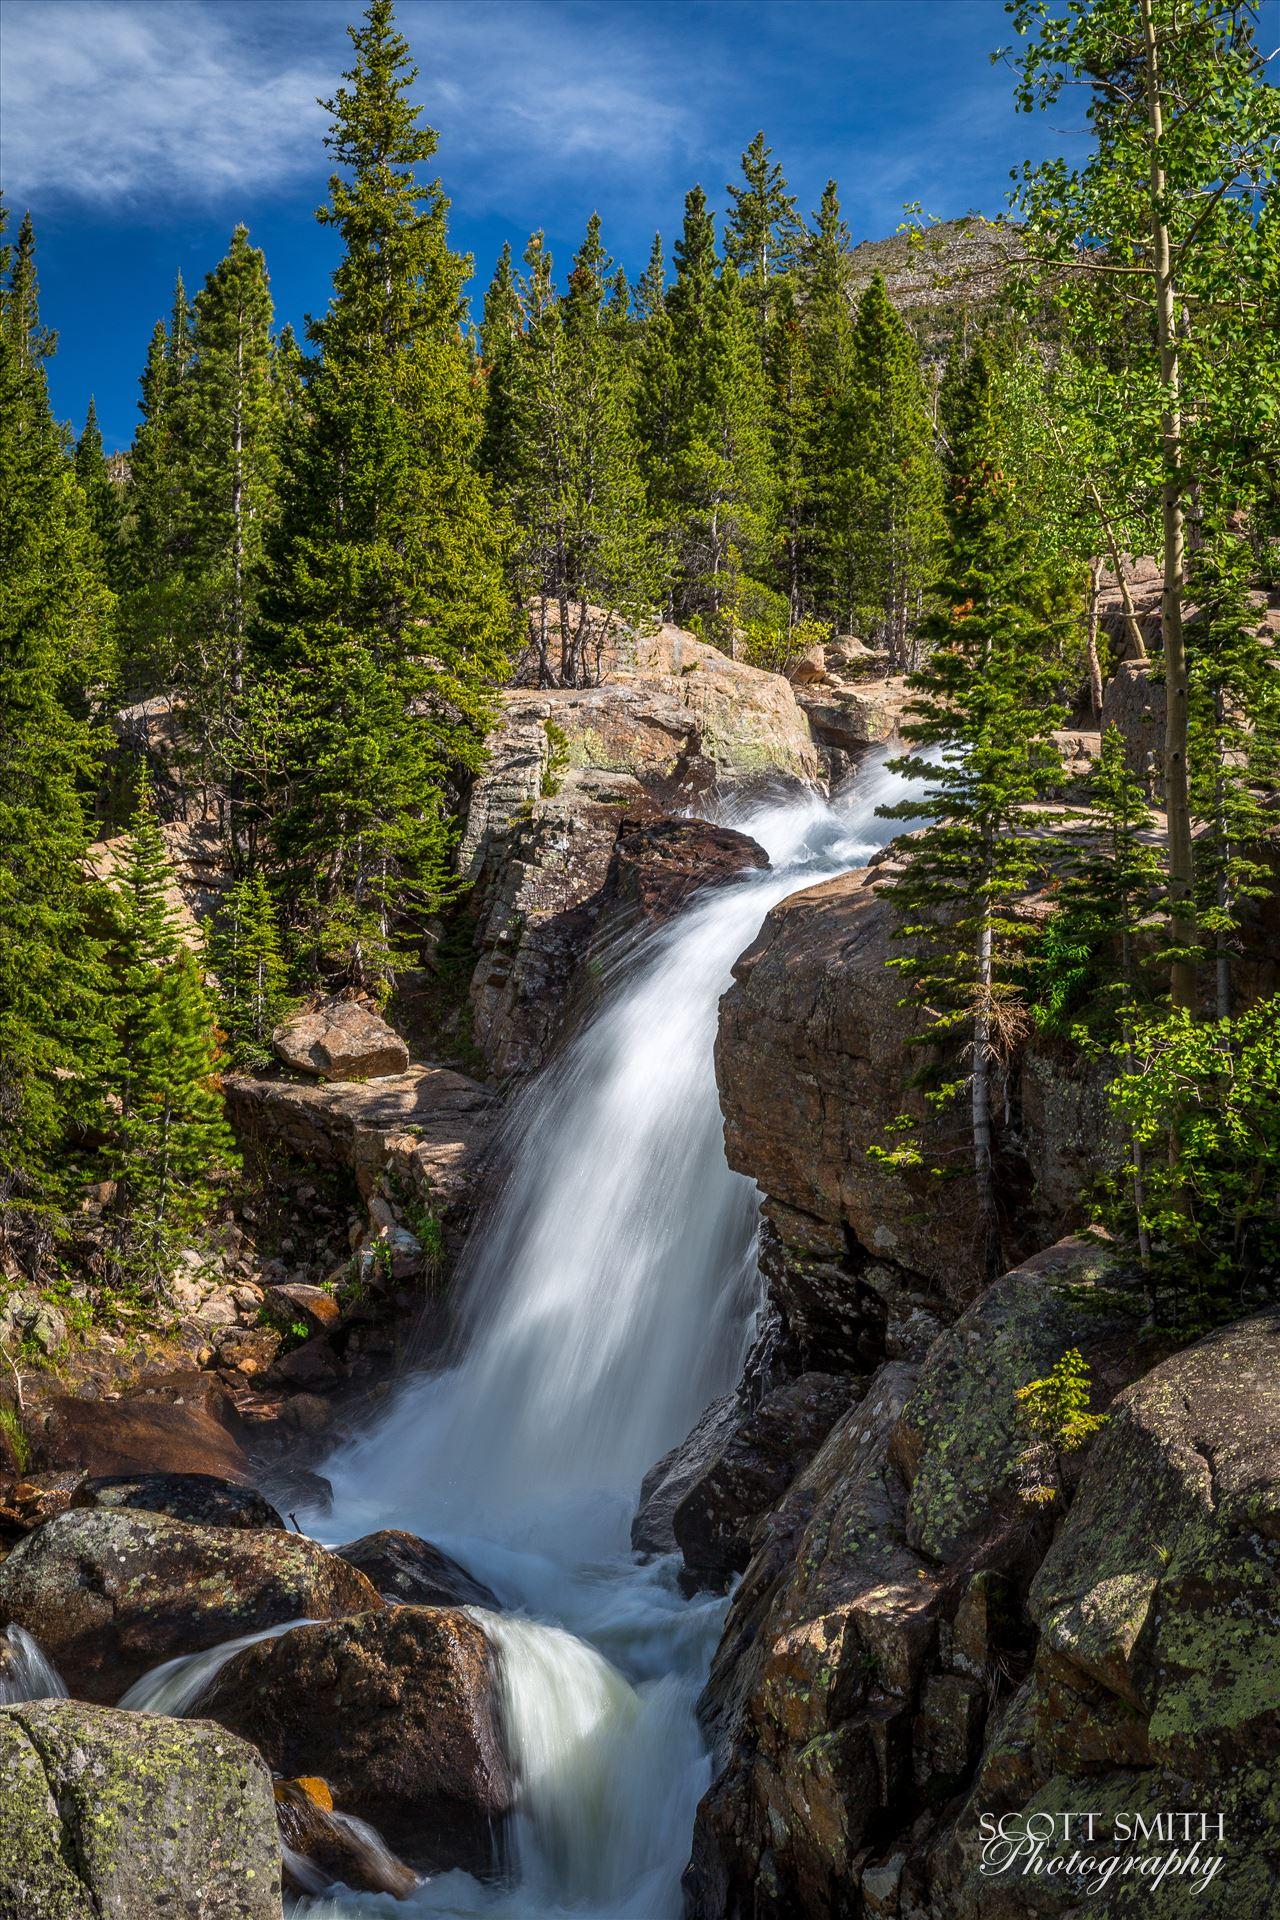 Alberta Falls No 2 - From the Rocky Mountain National Park, near Estes Park, Colorado. by D Scott Smith